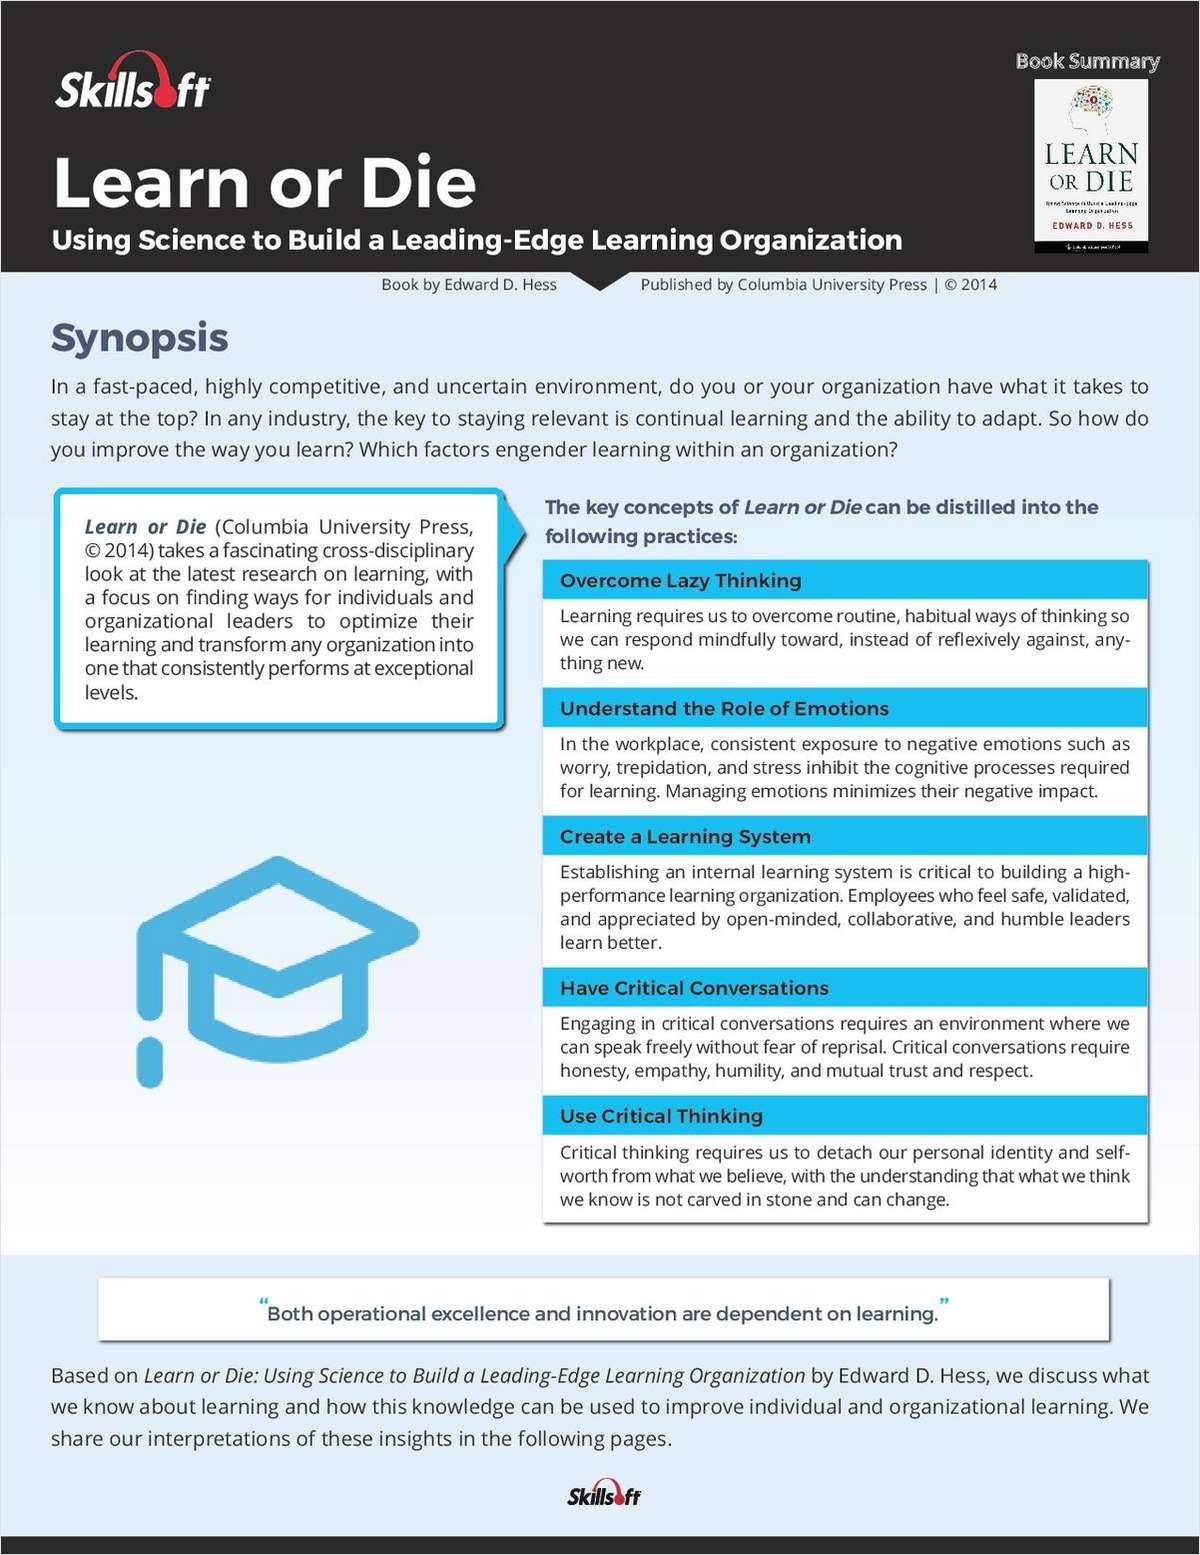 Skillsoft Book Summary: Learn or Die by Edward D. Hess